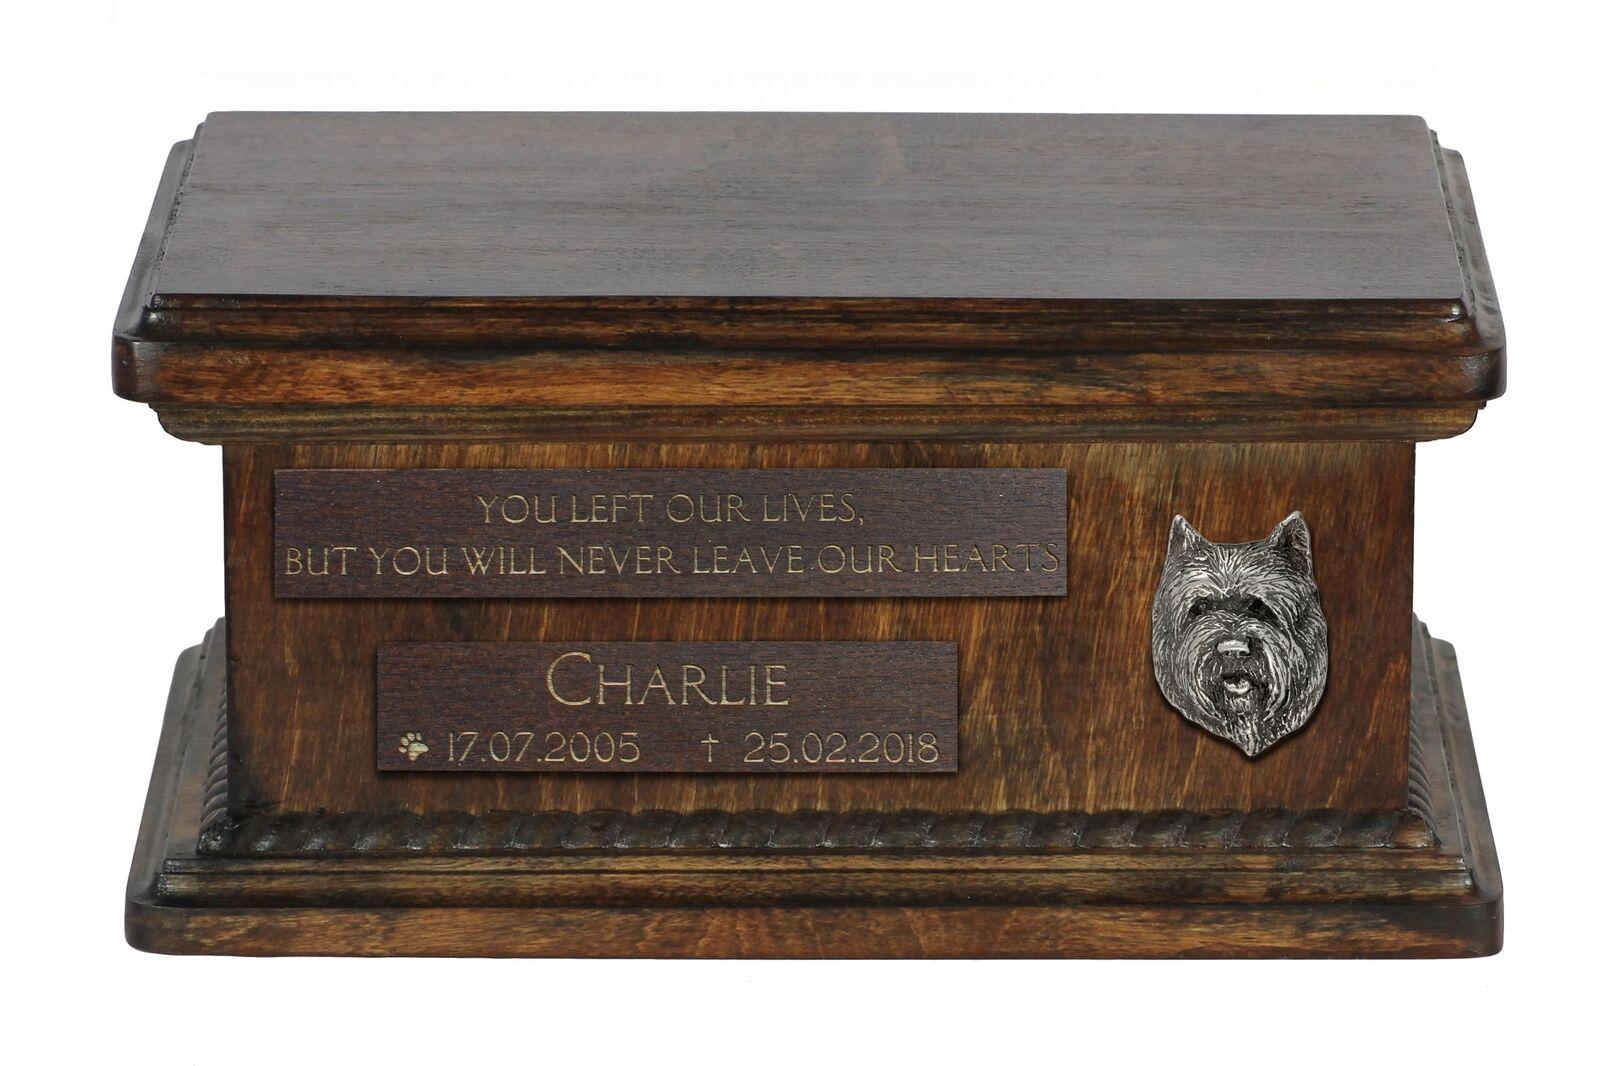 Cairn Terrier (2) - wooden urn for dog's ashes, low model, Art Dog